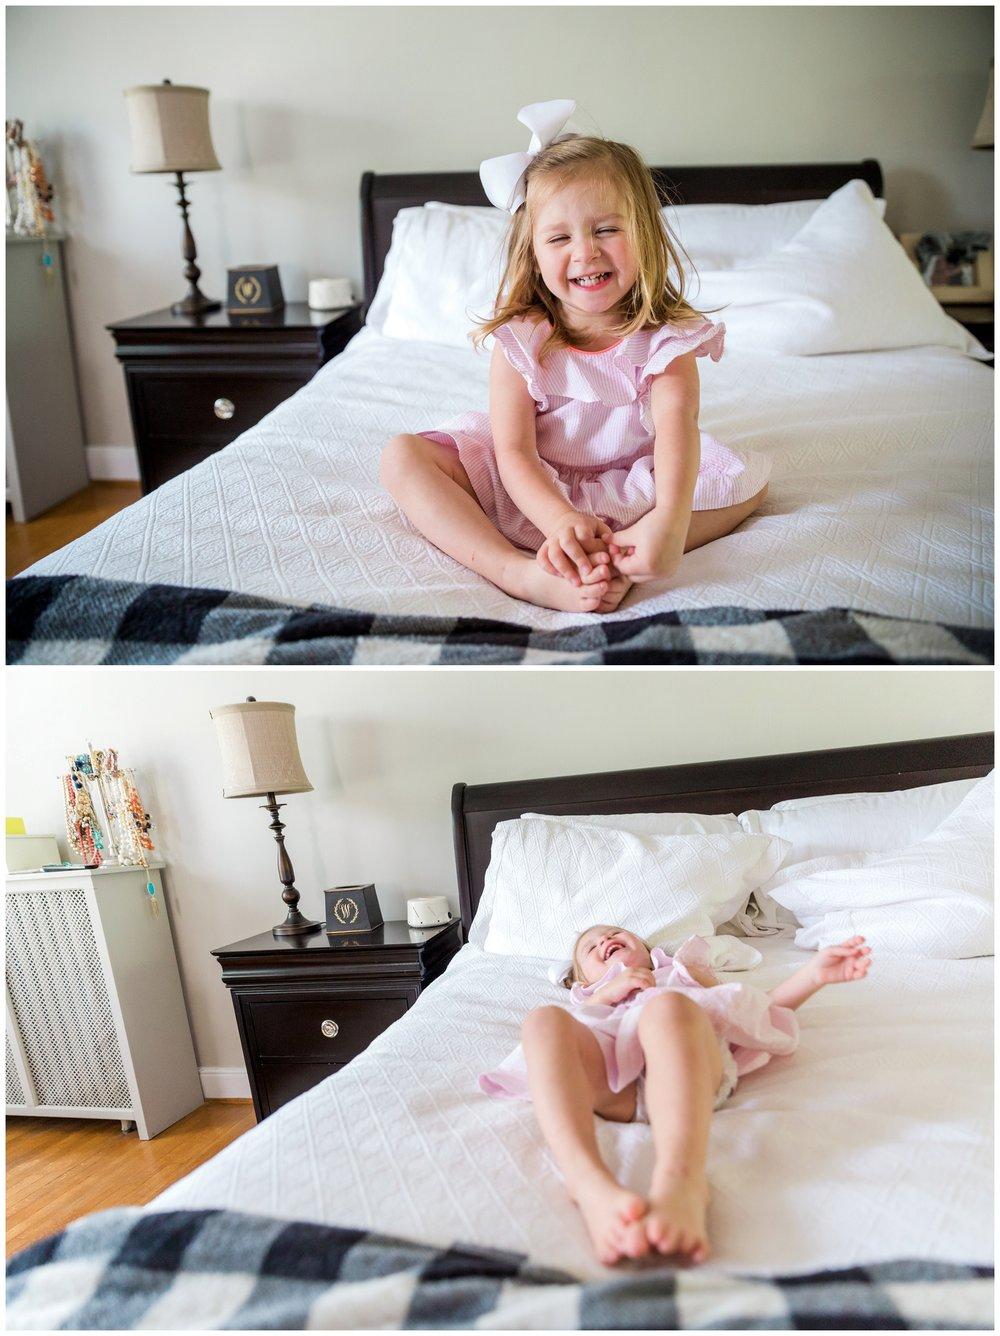 St Louis Newborn Photographer_Susie Vreeland Photography__Wood Family__2018 (11).jpg